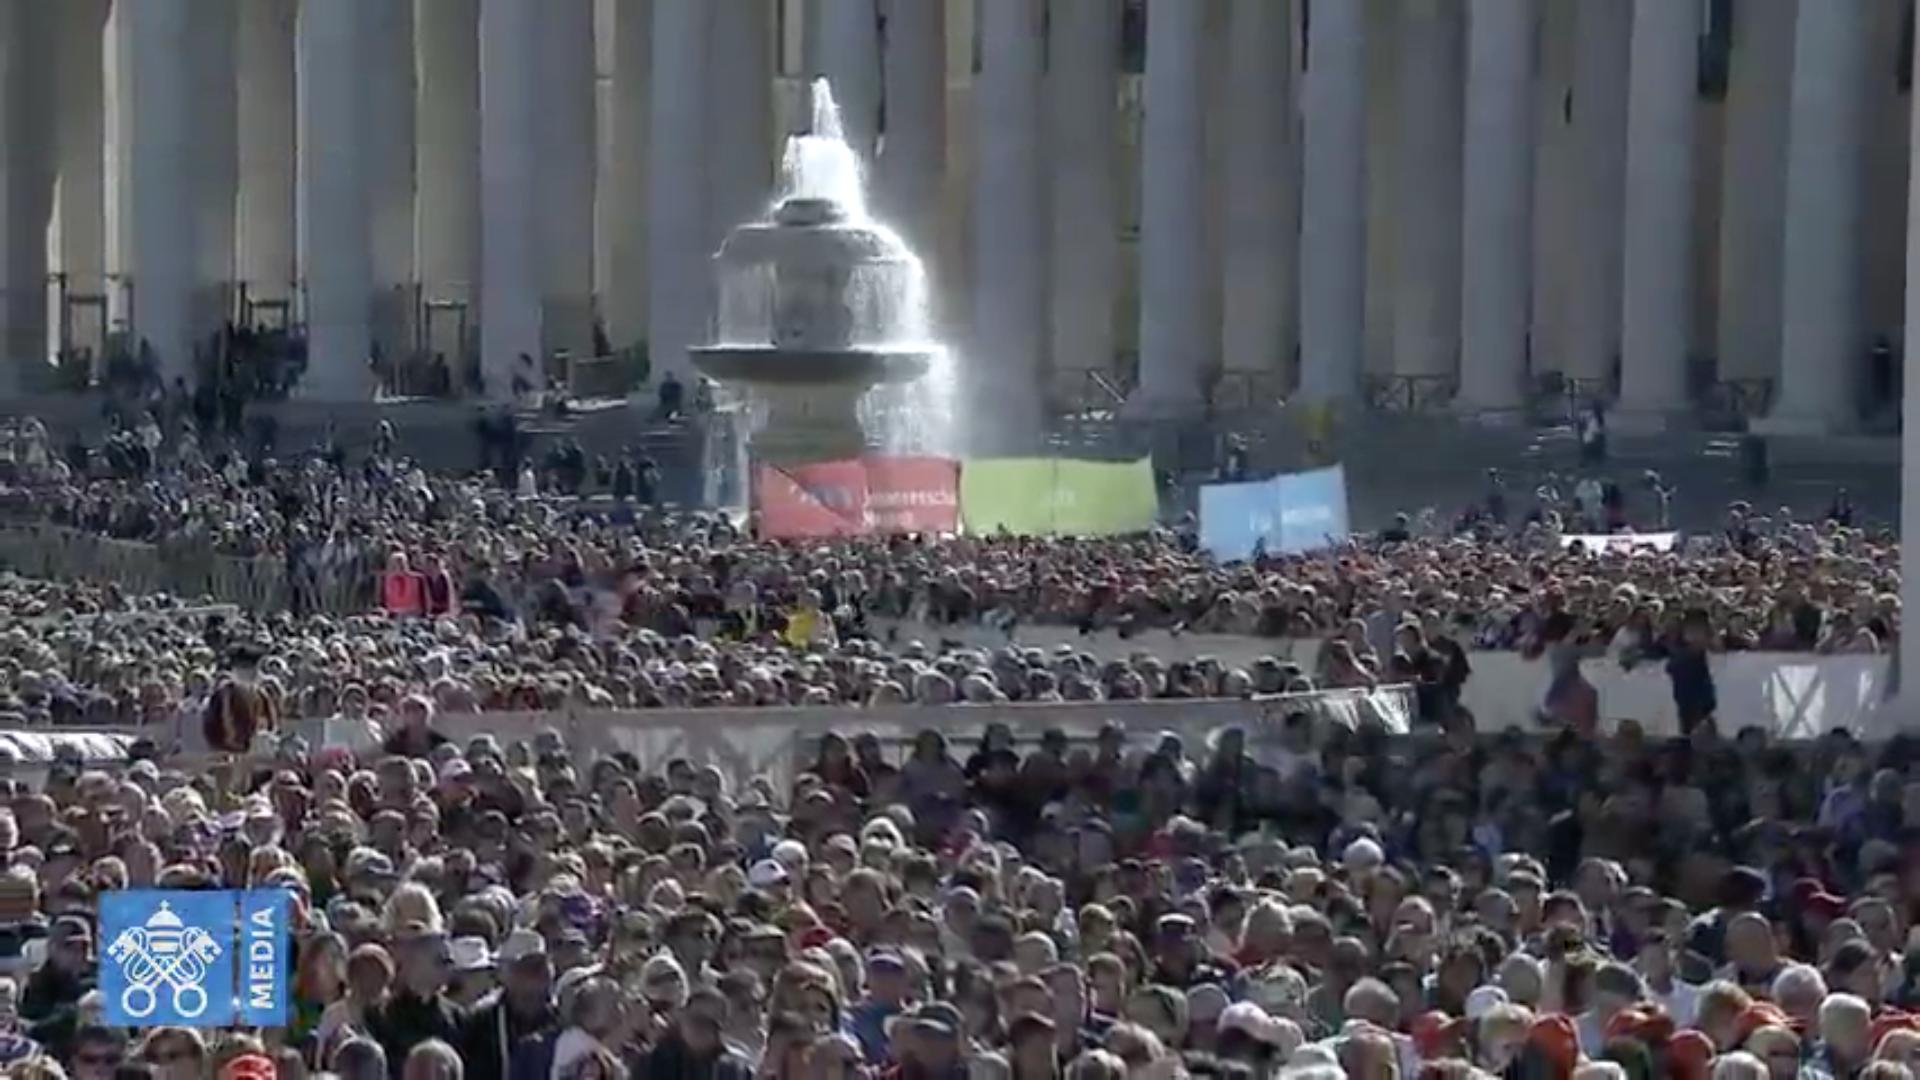 Audience, 26 sept. 2018 @Vatican News